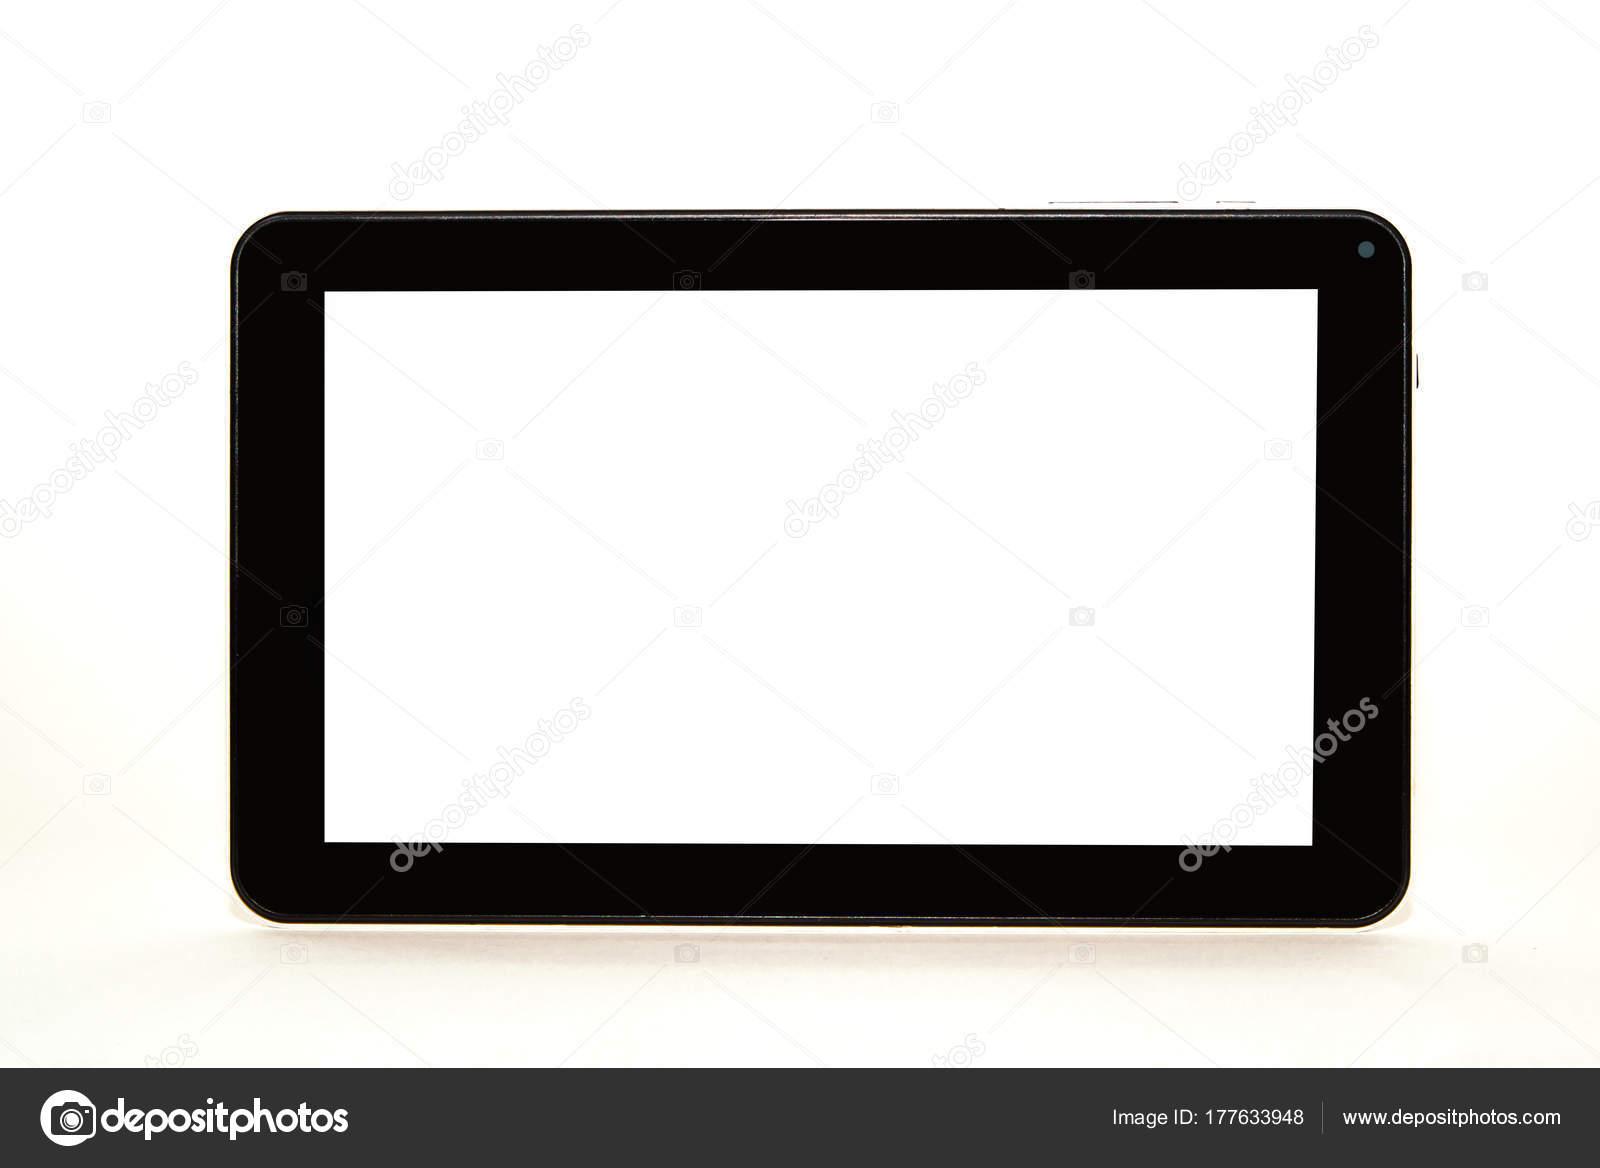 telecharger telephone pour tablette